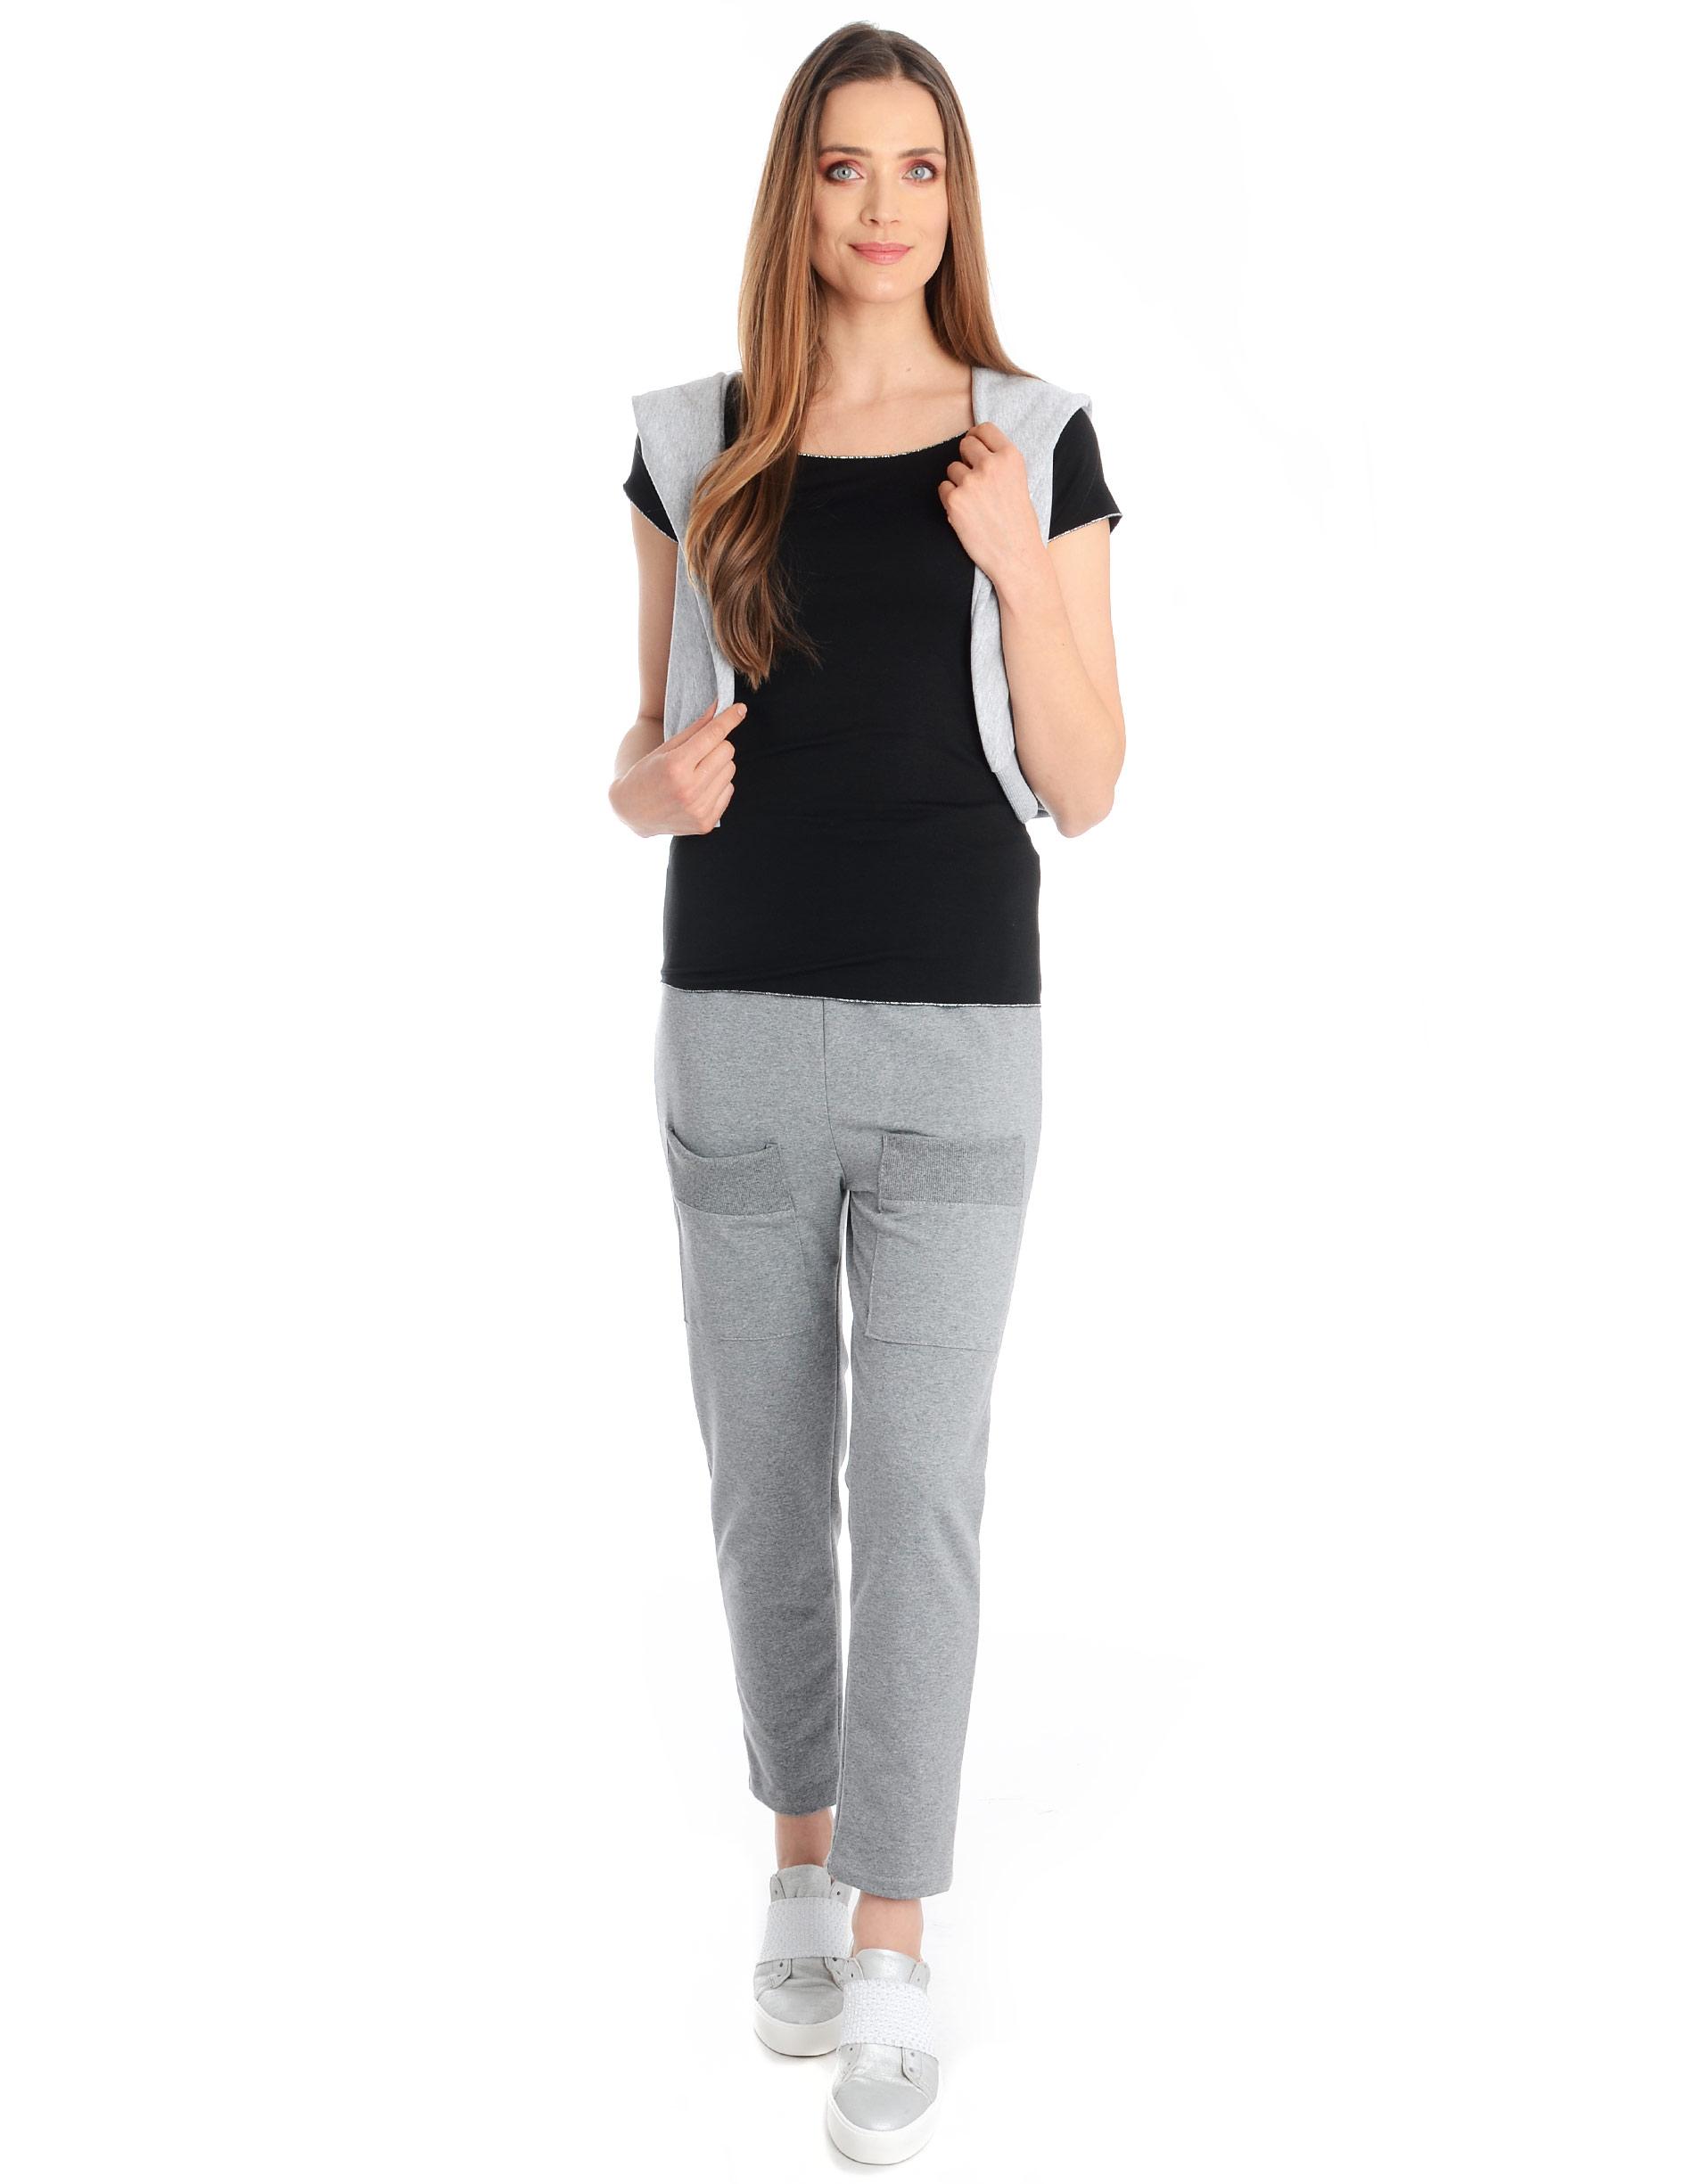 Spodnie - 80-2561 GRIGI - Unisono